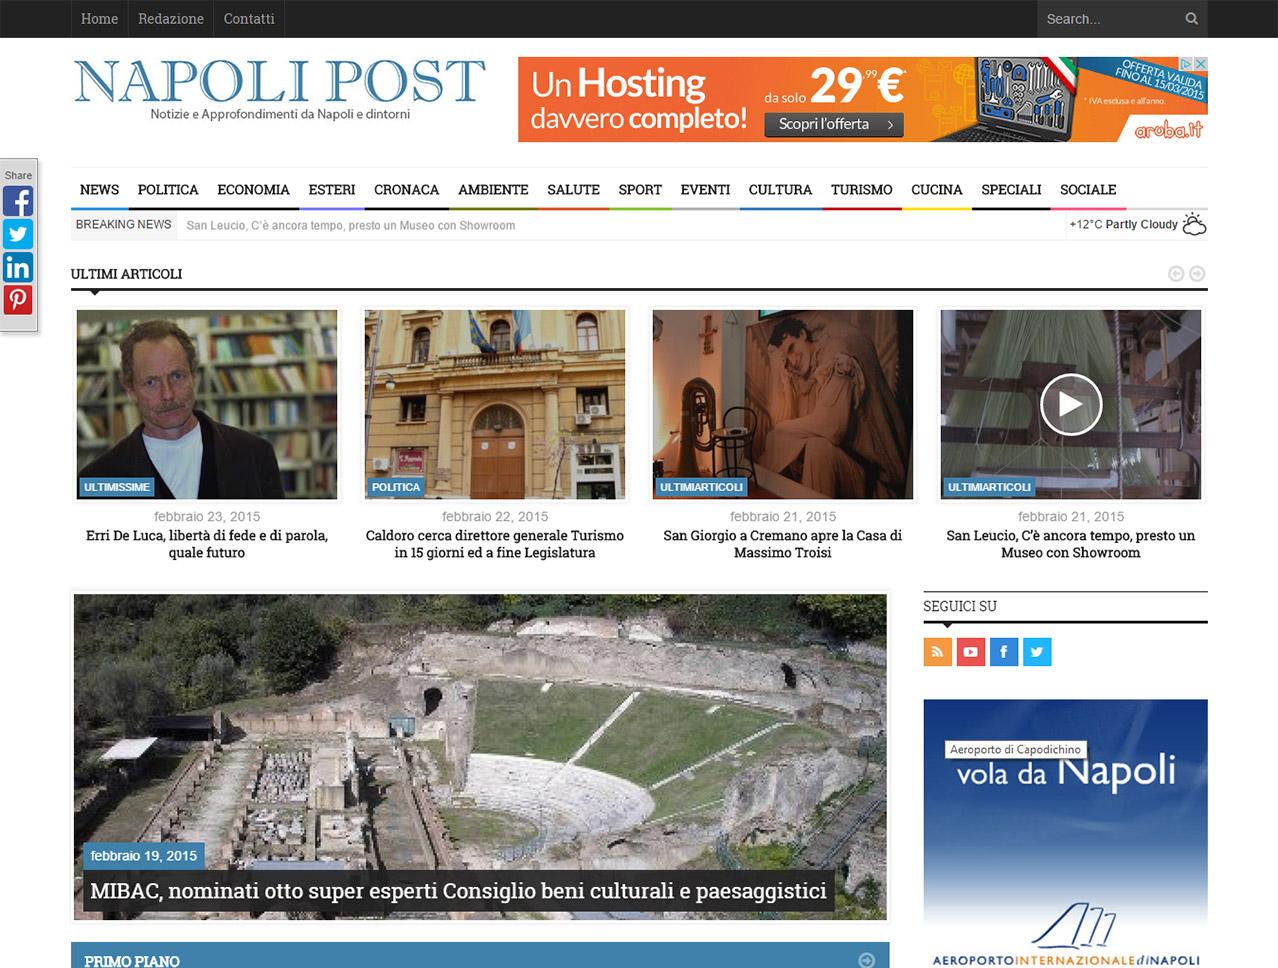 Napoli Post